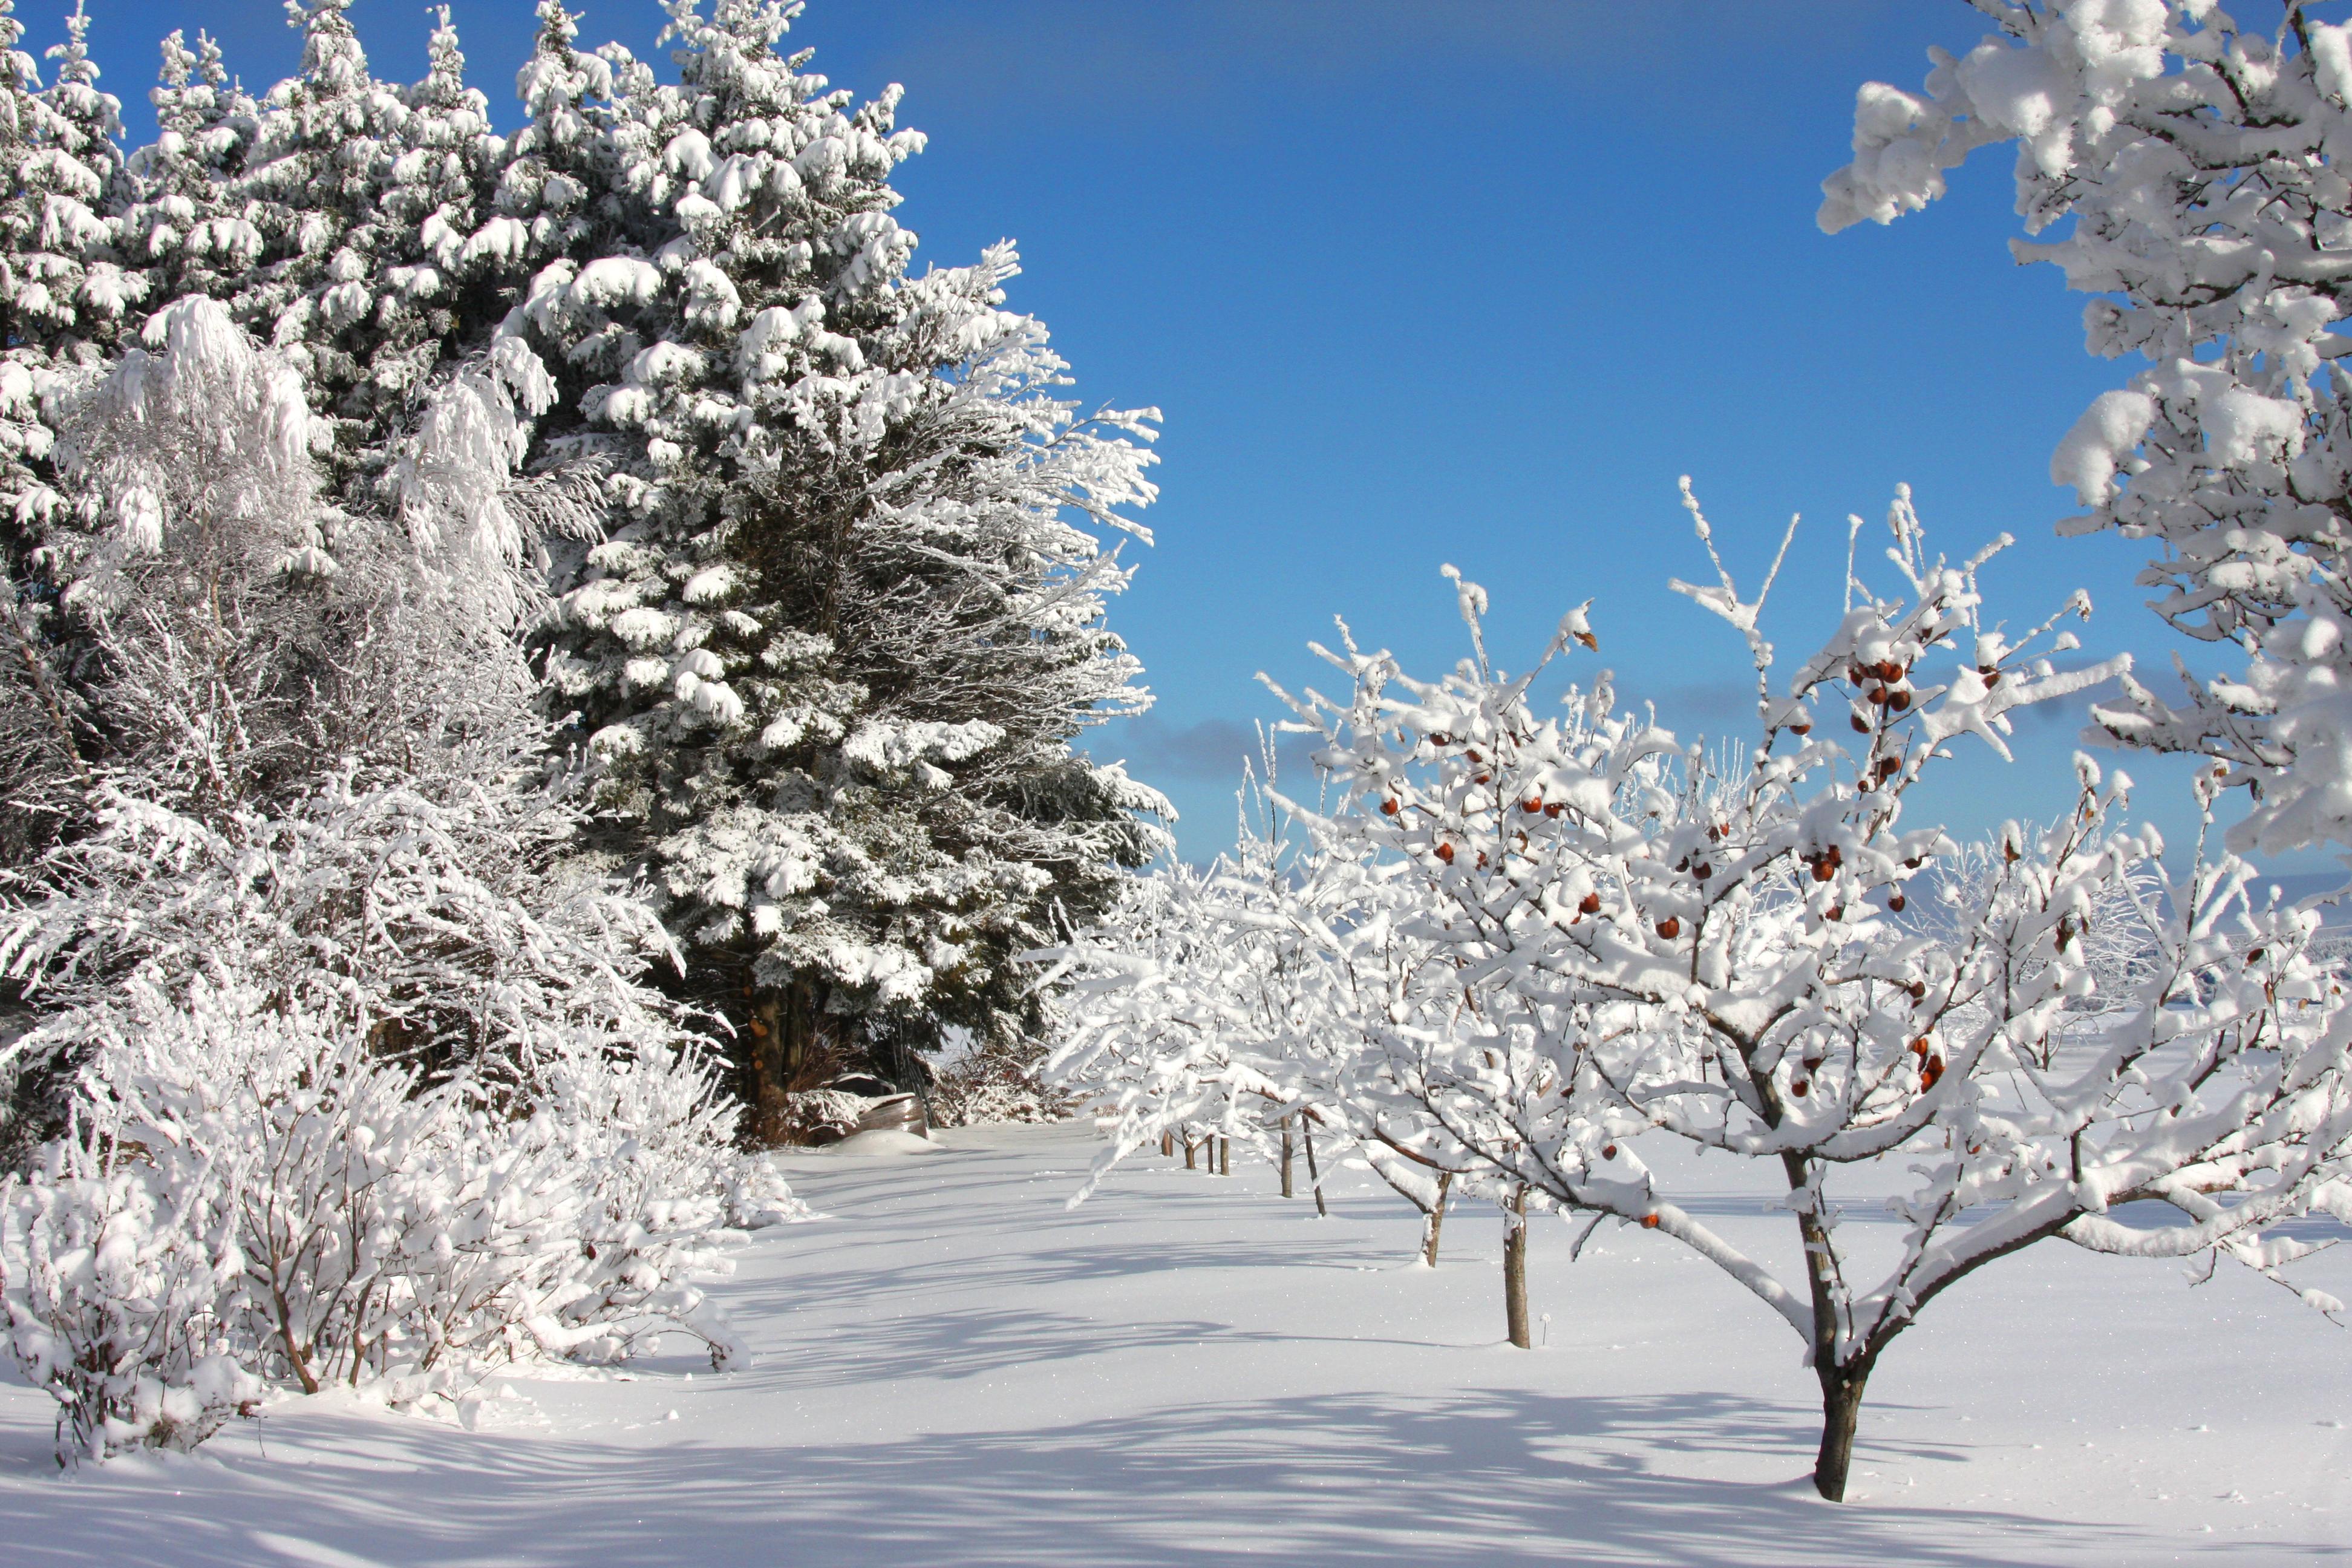 Paysage hiver fashion designs for Agence lignes paysage